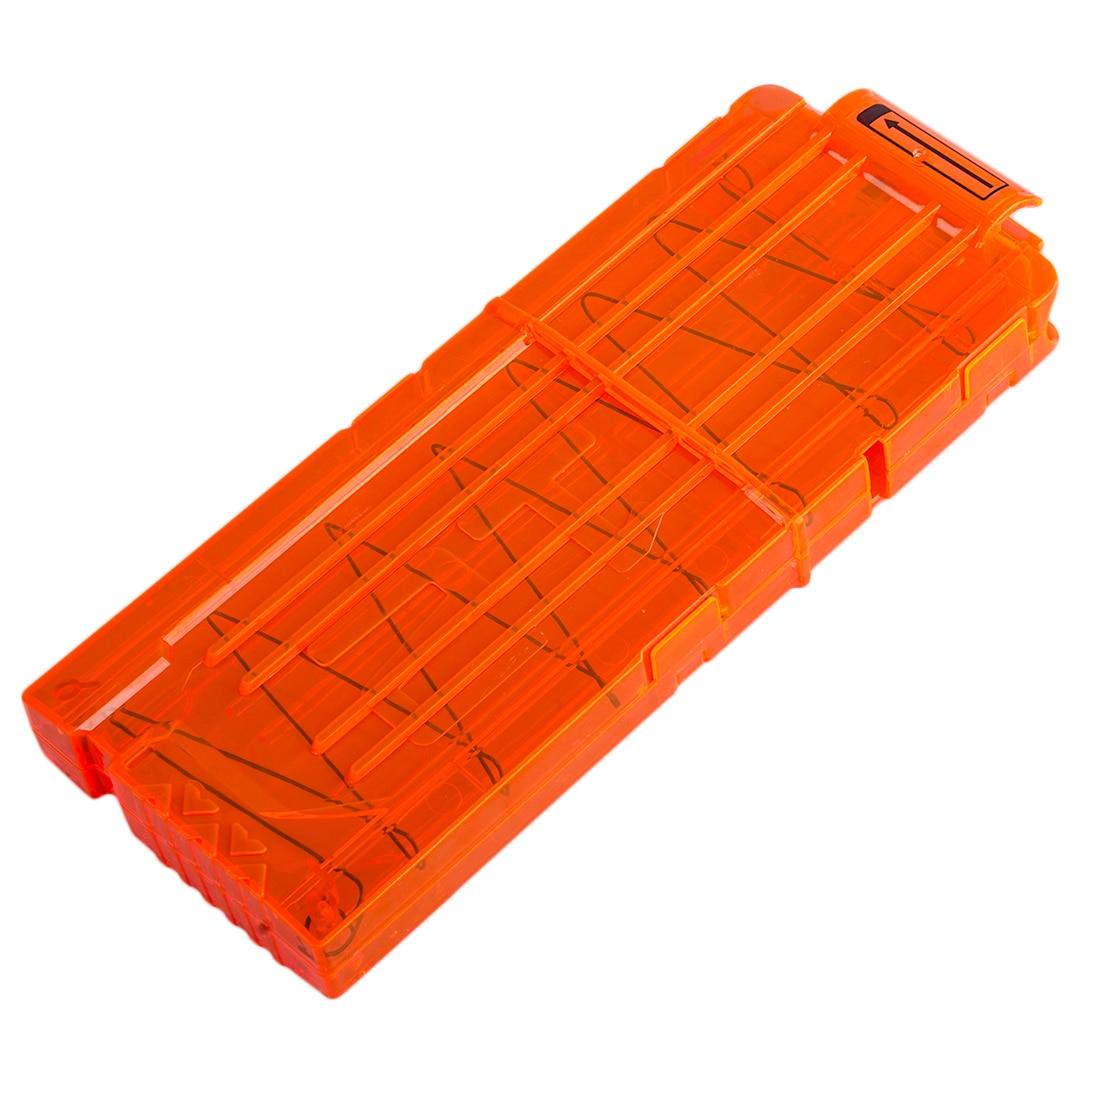 12 Reload Clip Magazines Round Darts Replacement Plastic Magazines Toy Gun Soft Bullet Clip Orange For Nerf N-Strike